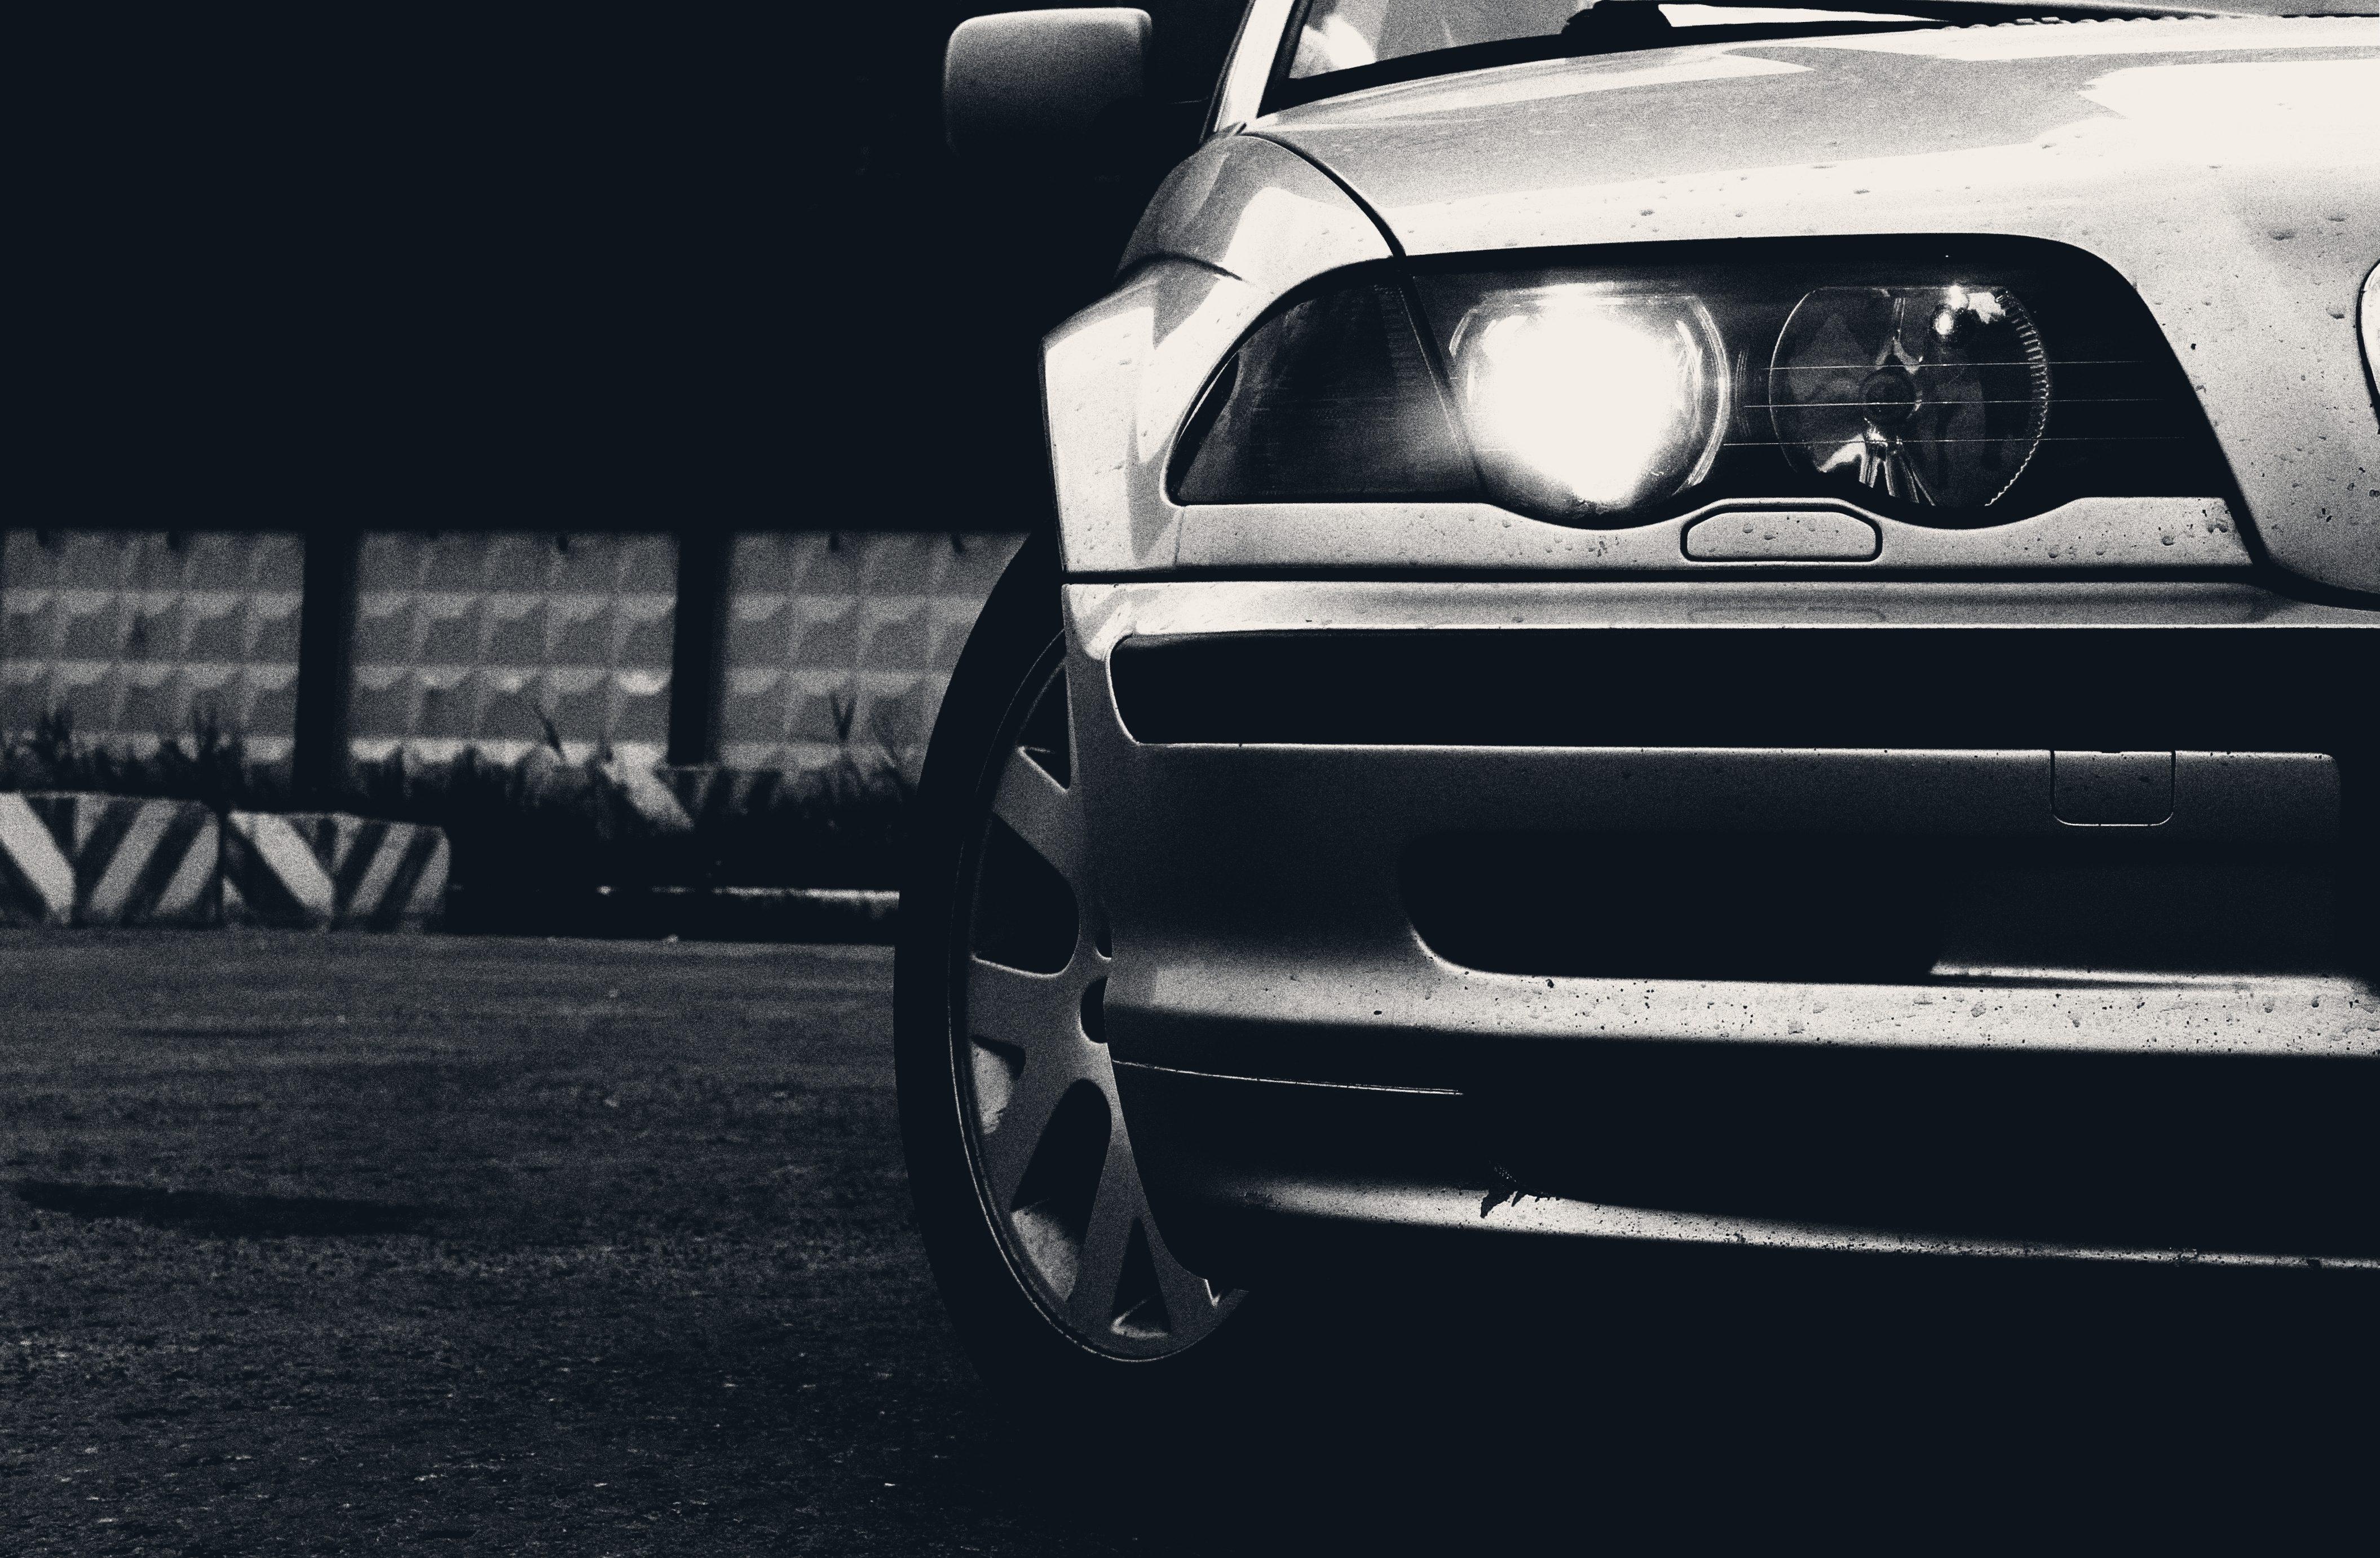 Черно белые фото машин